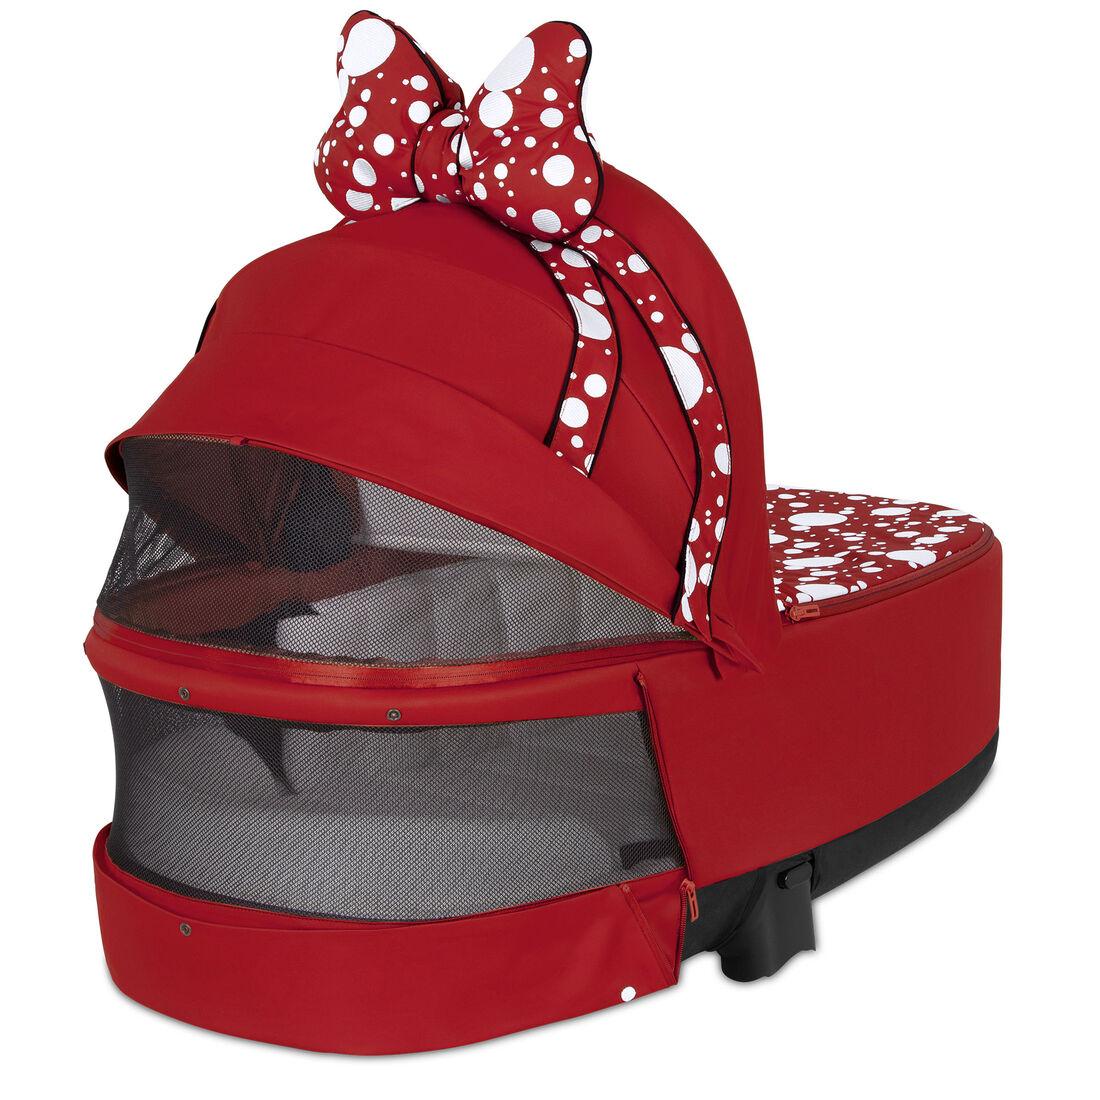 CYBEX Priam Lux Carry Cot - Petticoat Red in Petticoat Red large Bild 4